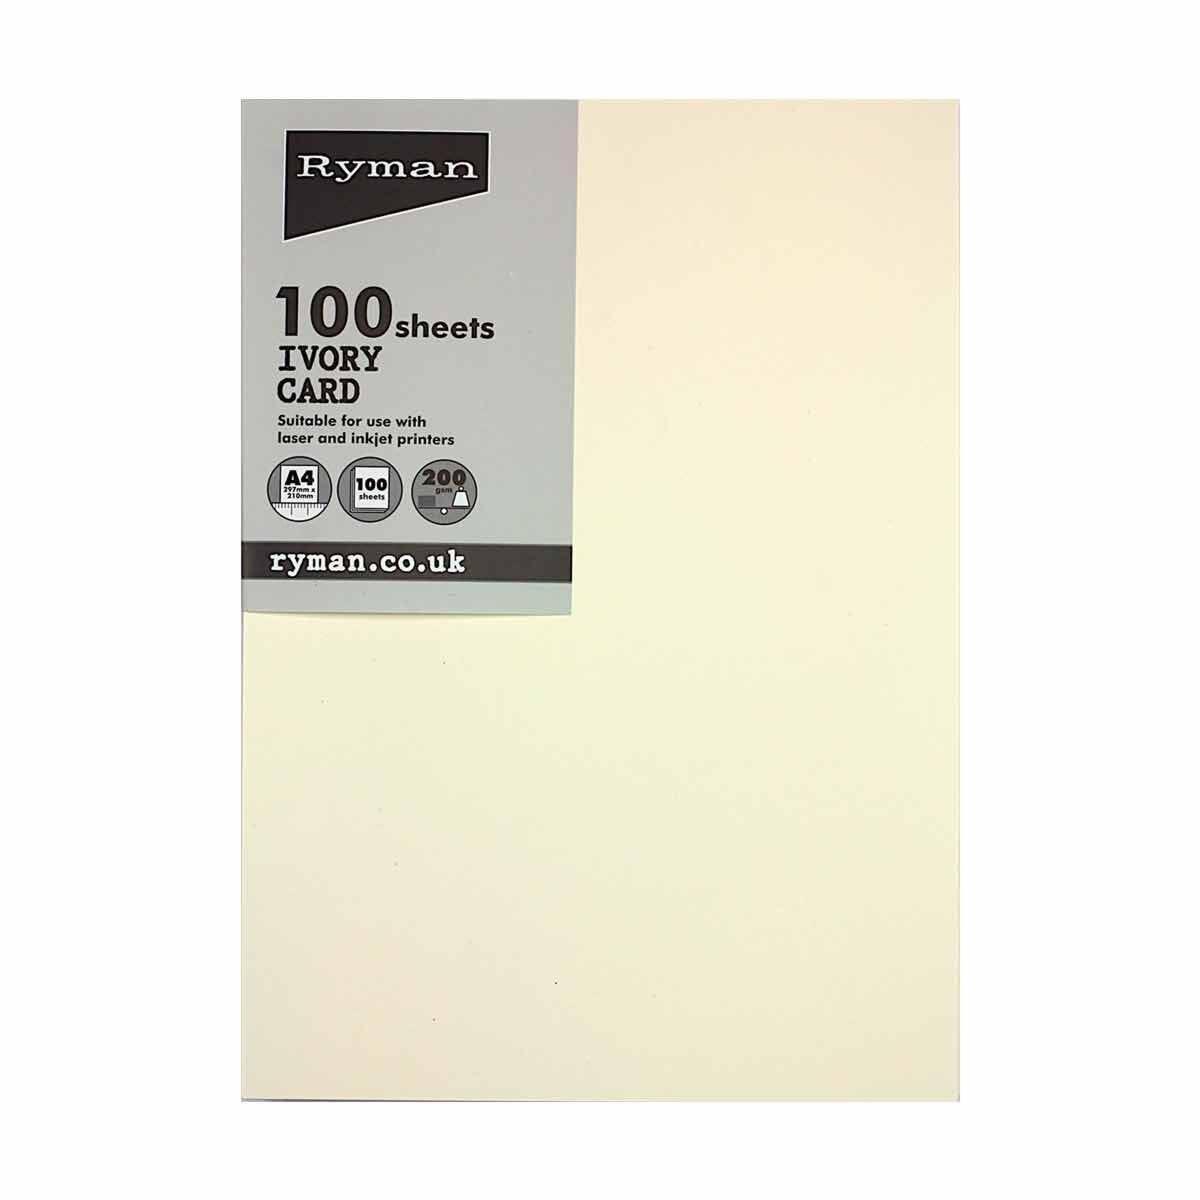 Ryman Card A4 200gsm 100 Sheets Ivory